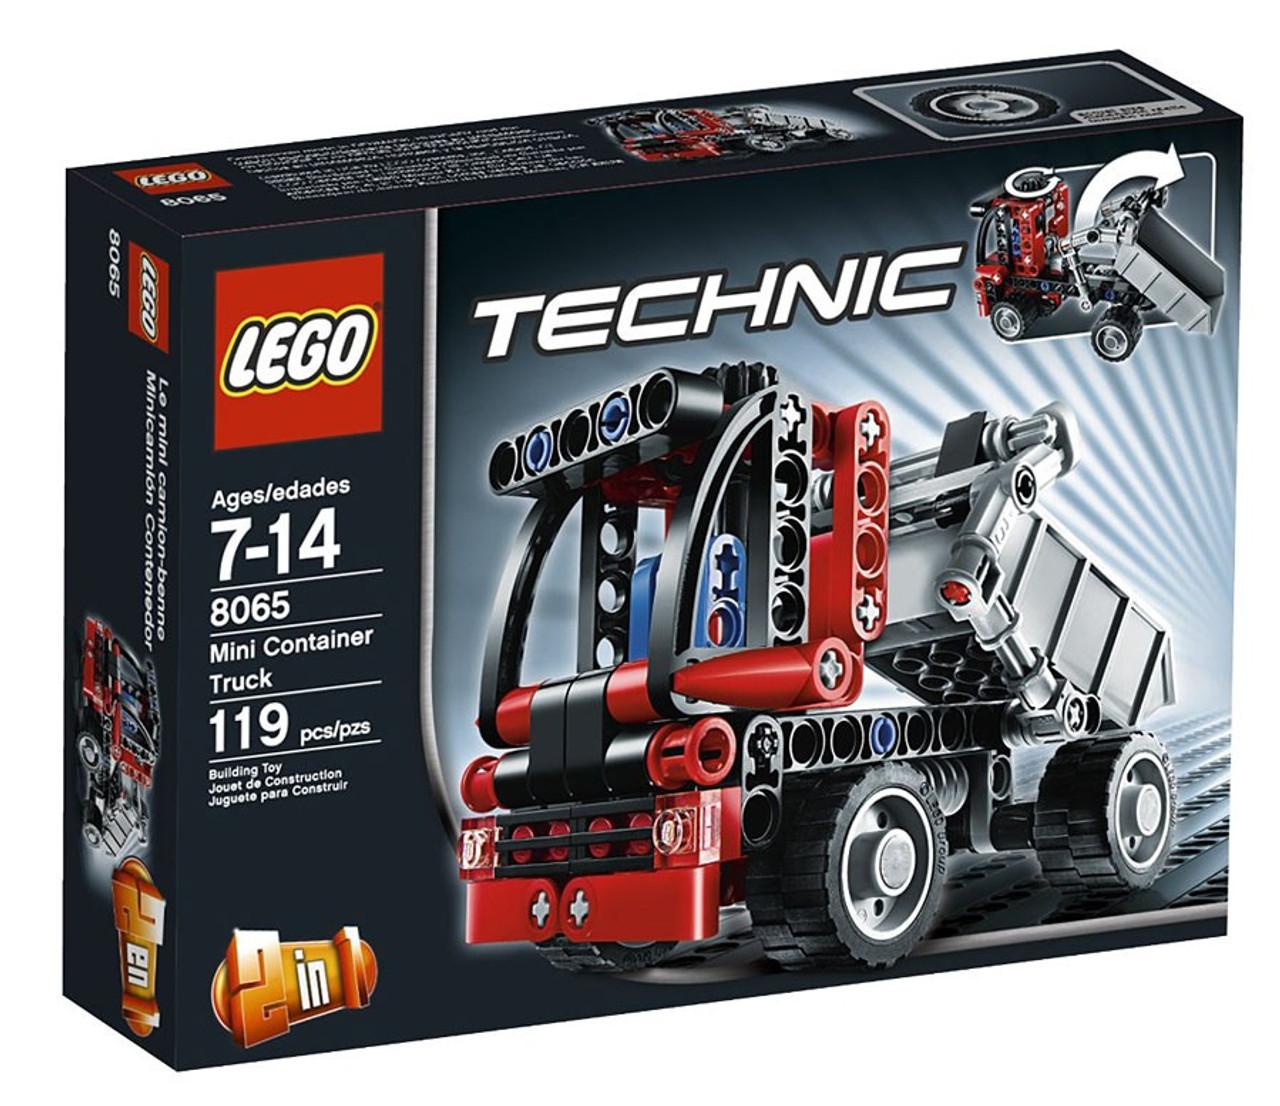 LEGO Technic Mini Container Truck Set #8065